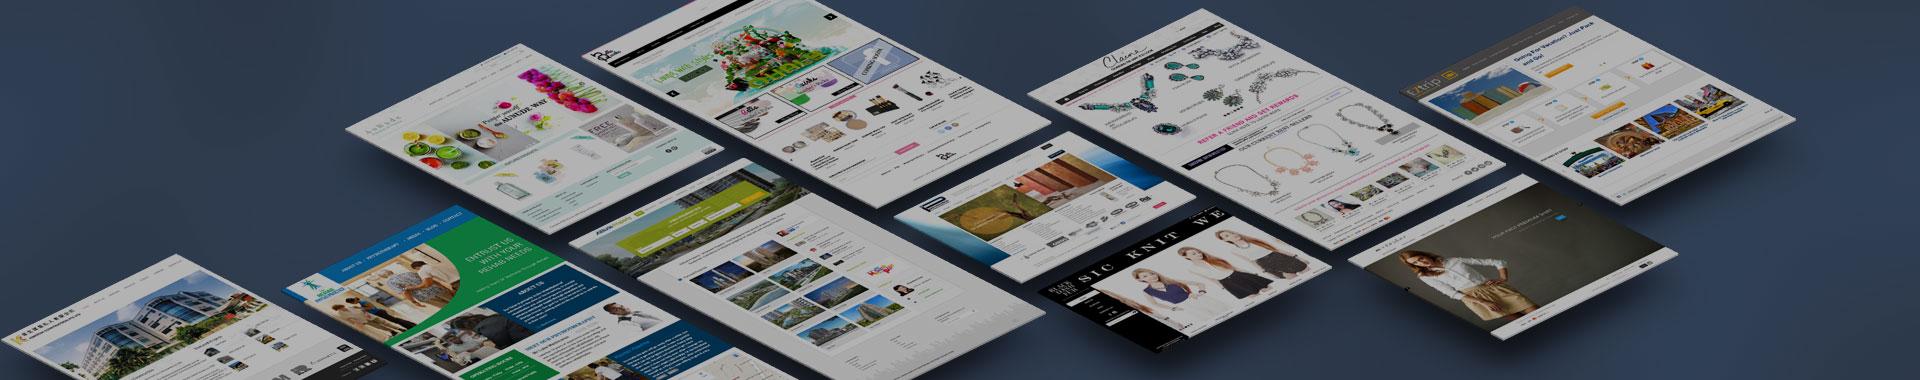 Website Design Singapore - Full Potential Chiropractic